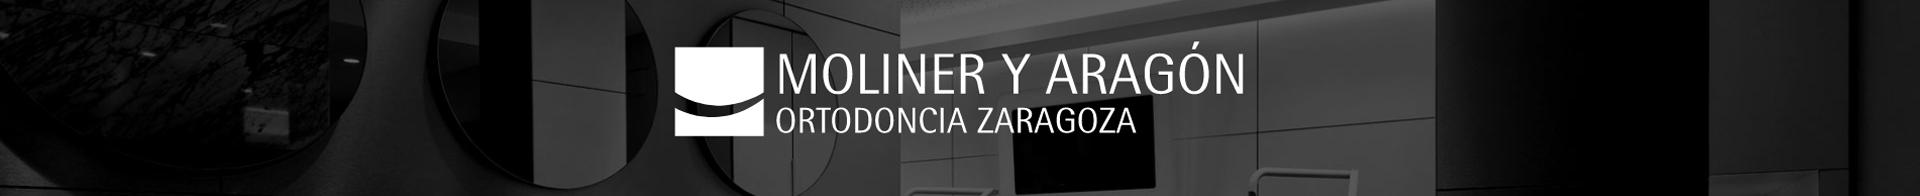 Clínica ortodoncia Zaragoza